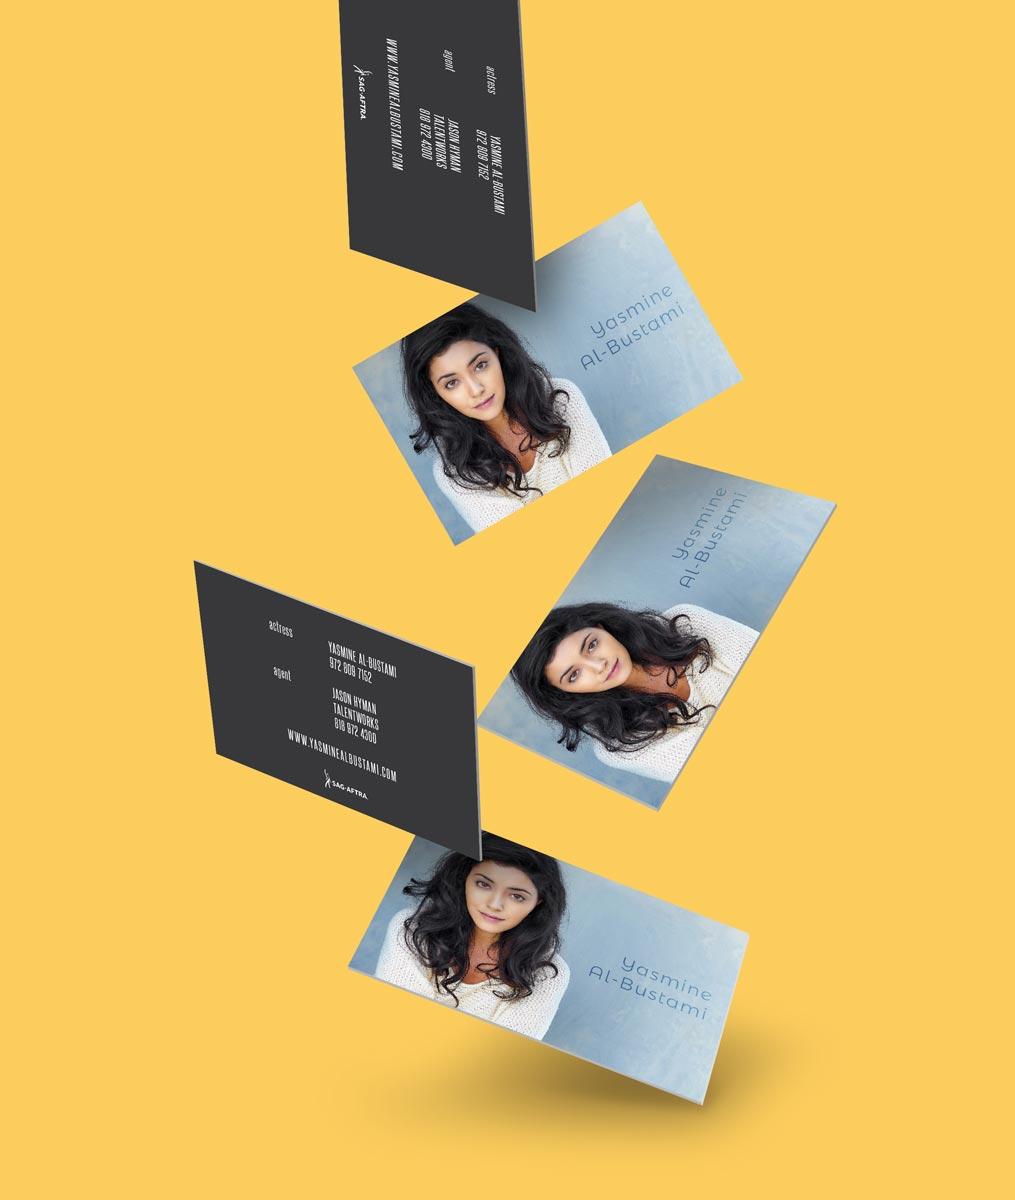 Personal Branding for Yasmine Al-Bustami